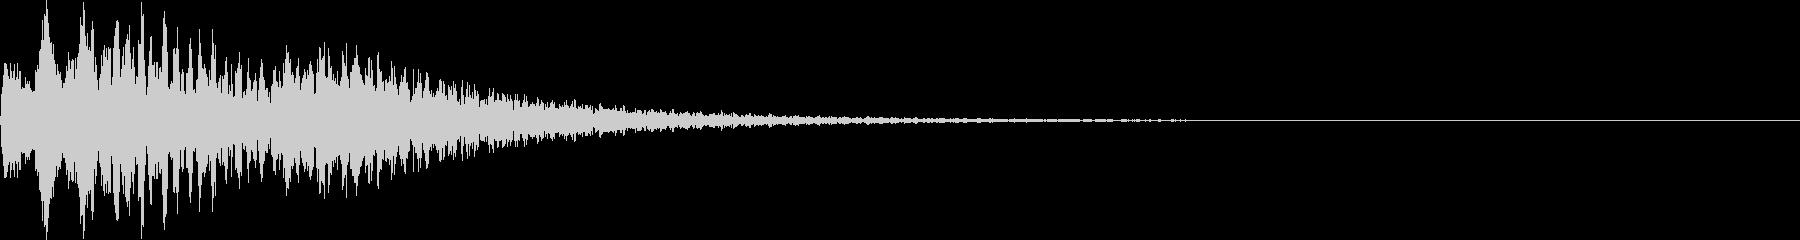 【SE】決定音07(キシーン)の未再生の波形